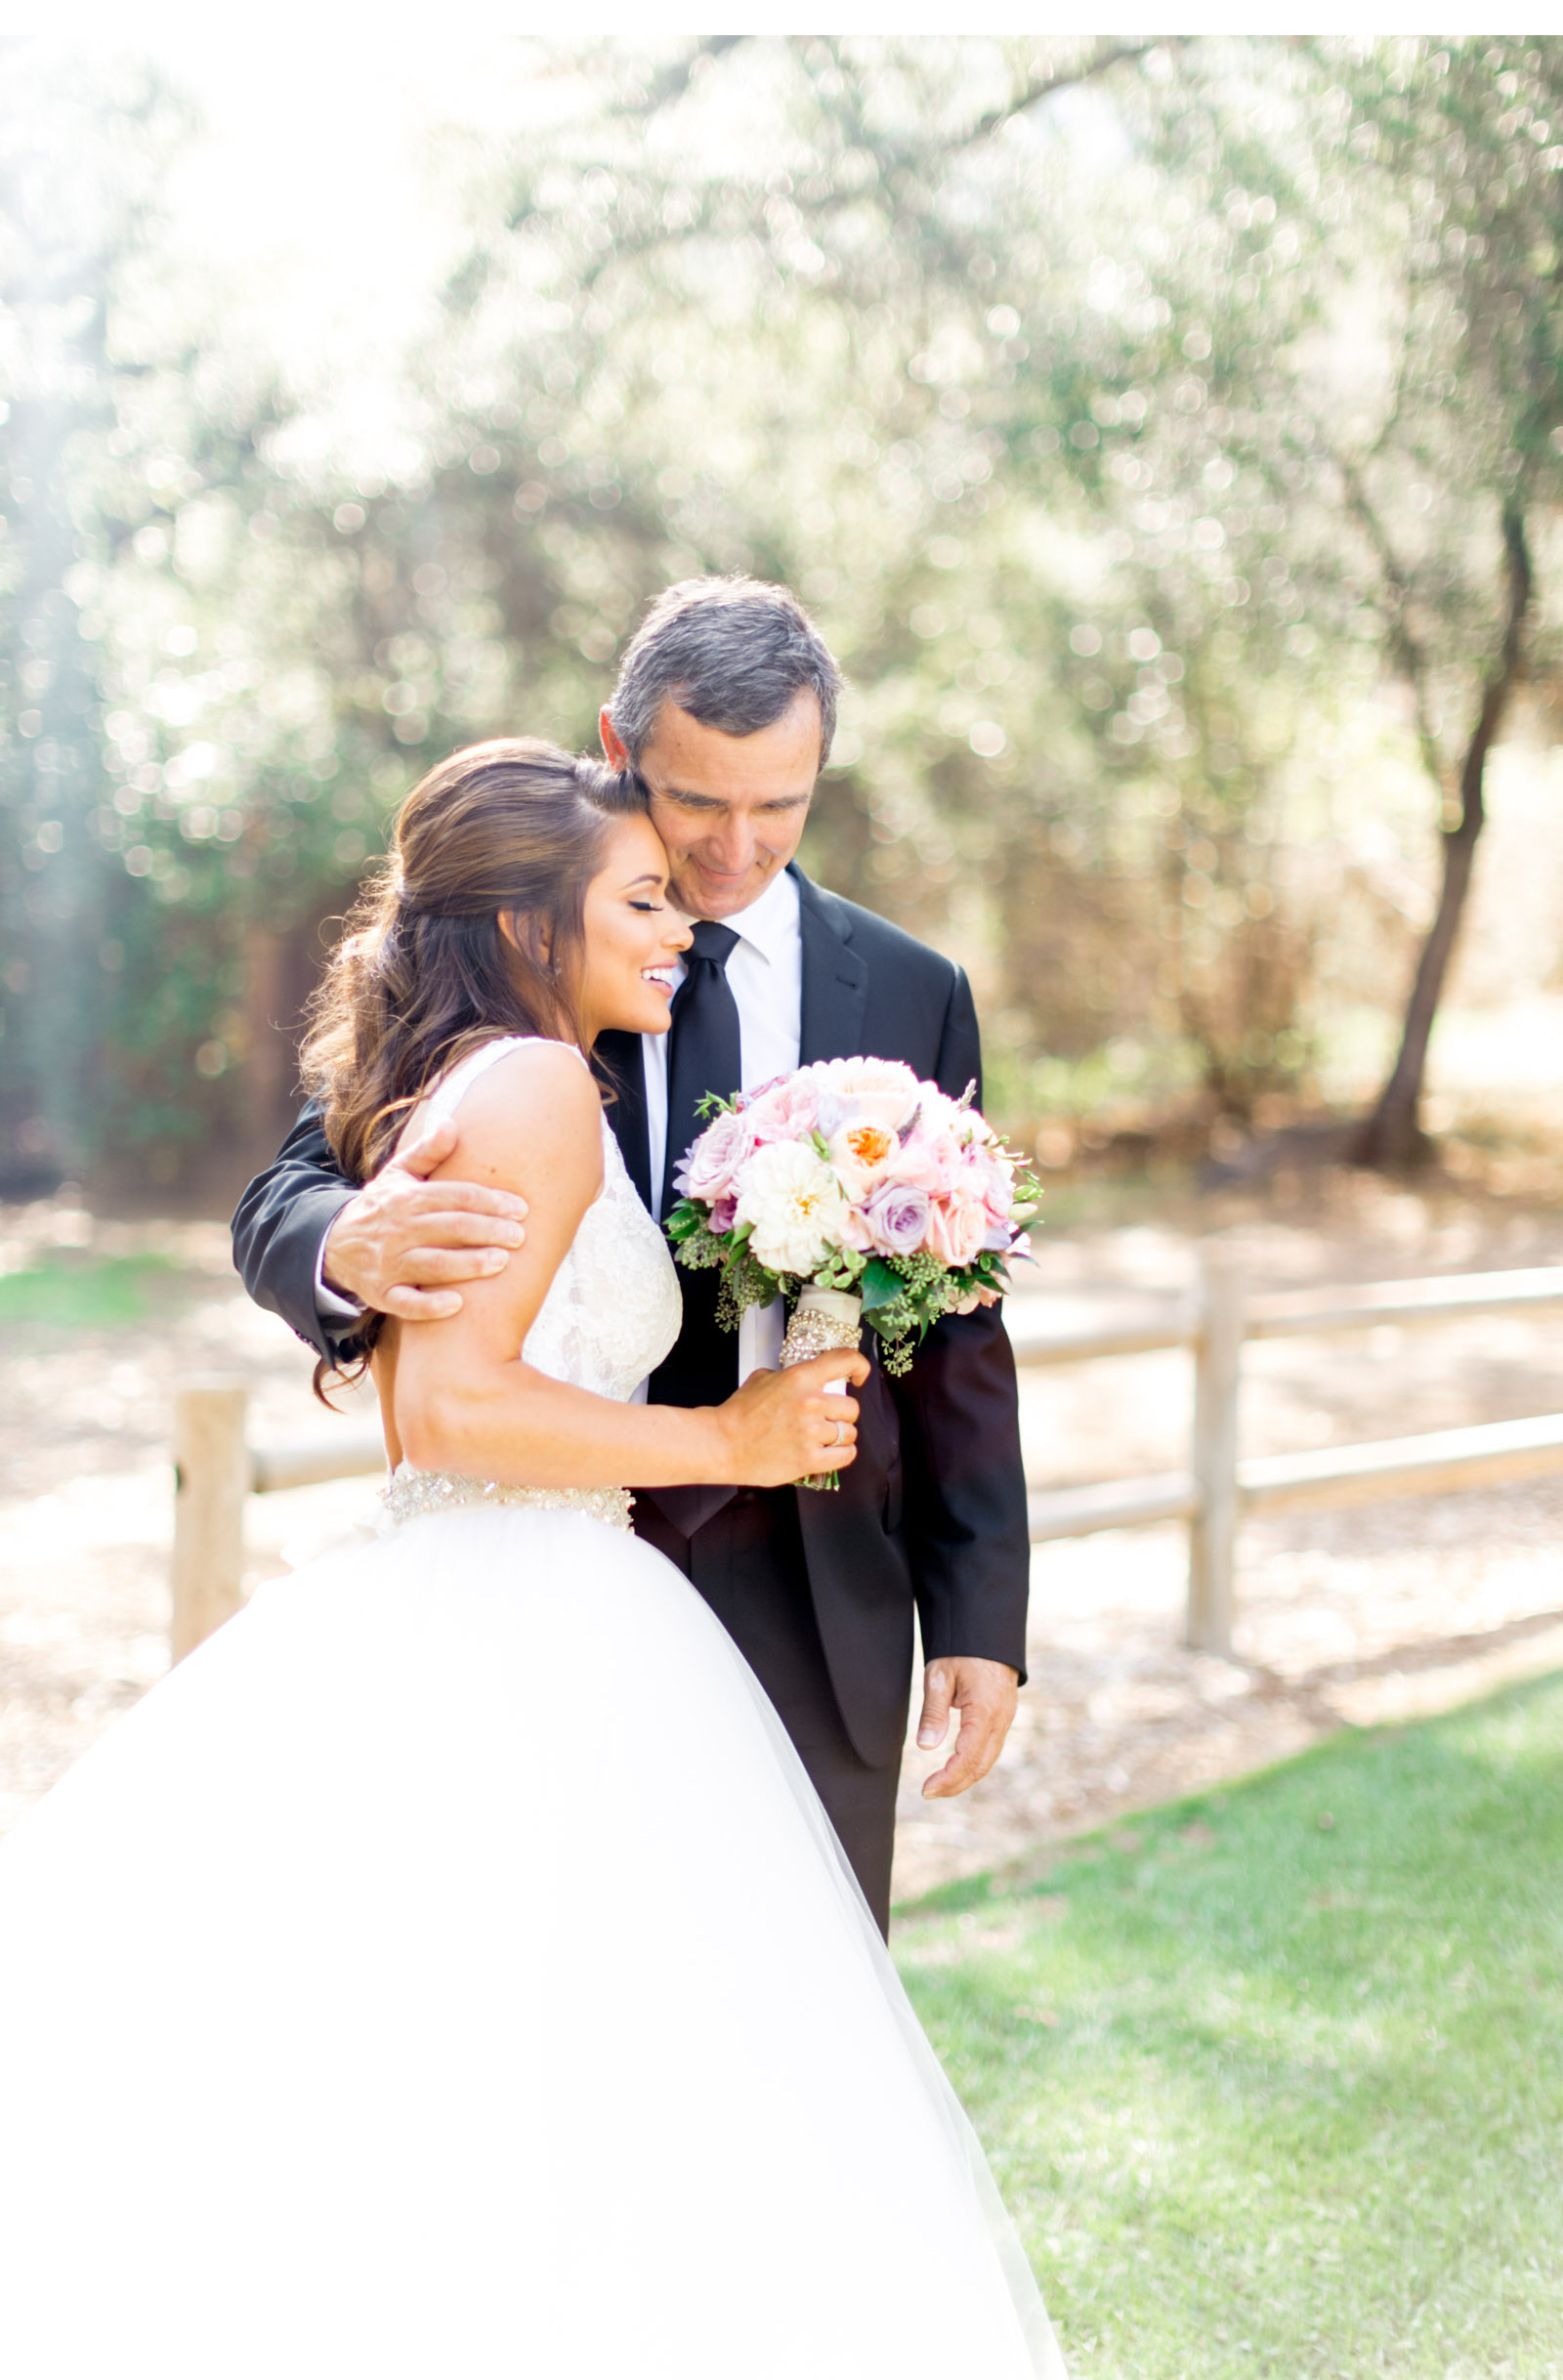 Nia-&-Daniel-Booko-Wedding-Natalie-Schutt-Photography_02.jpg